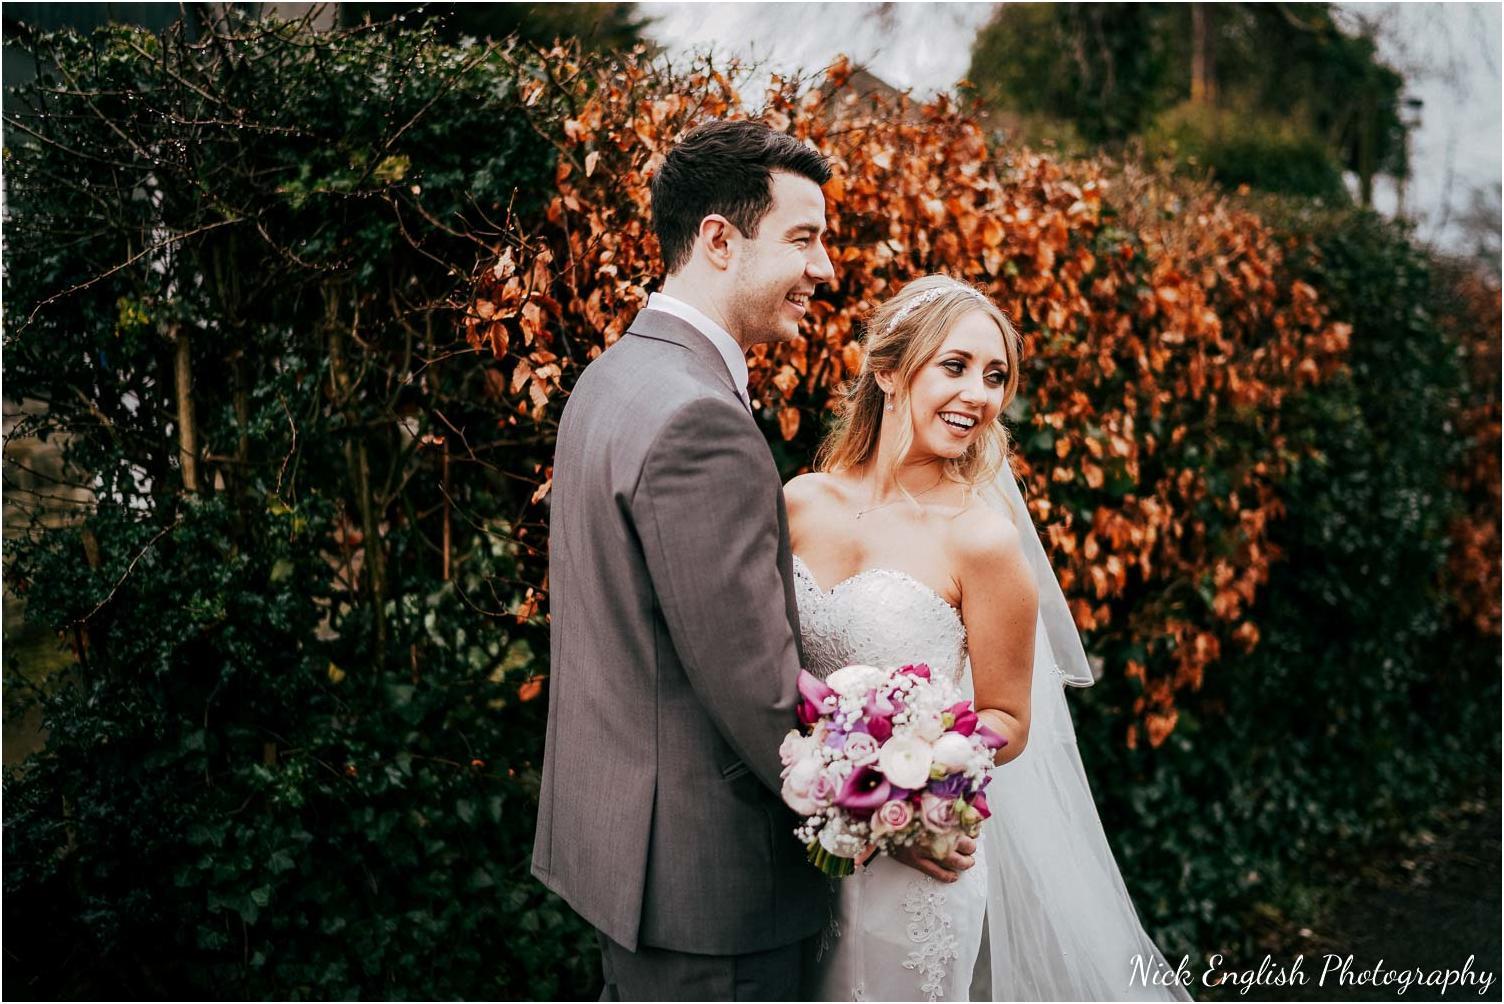 Mitton_Hall_Wedding_Photographer_2018-91.jpg